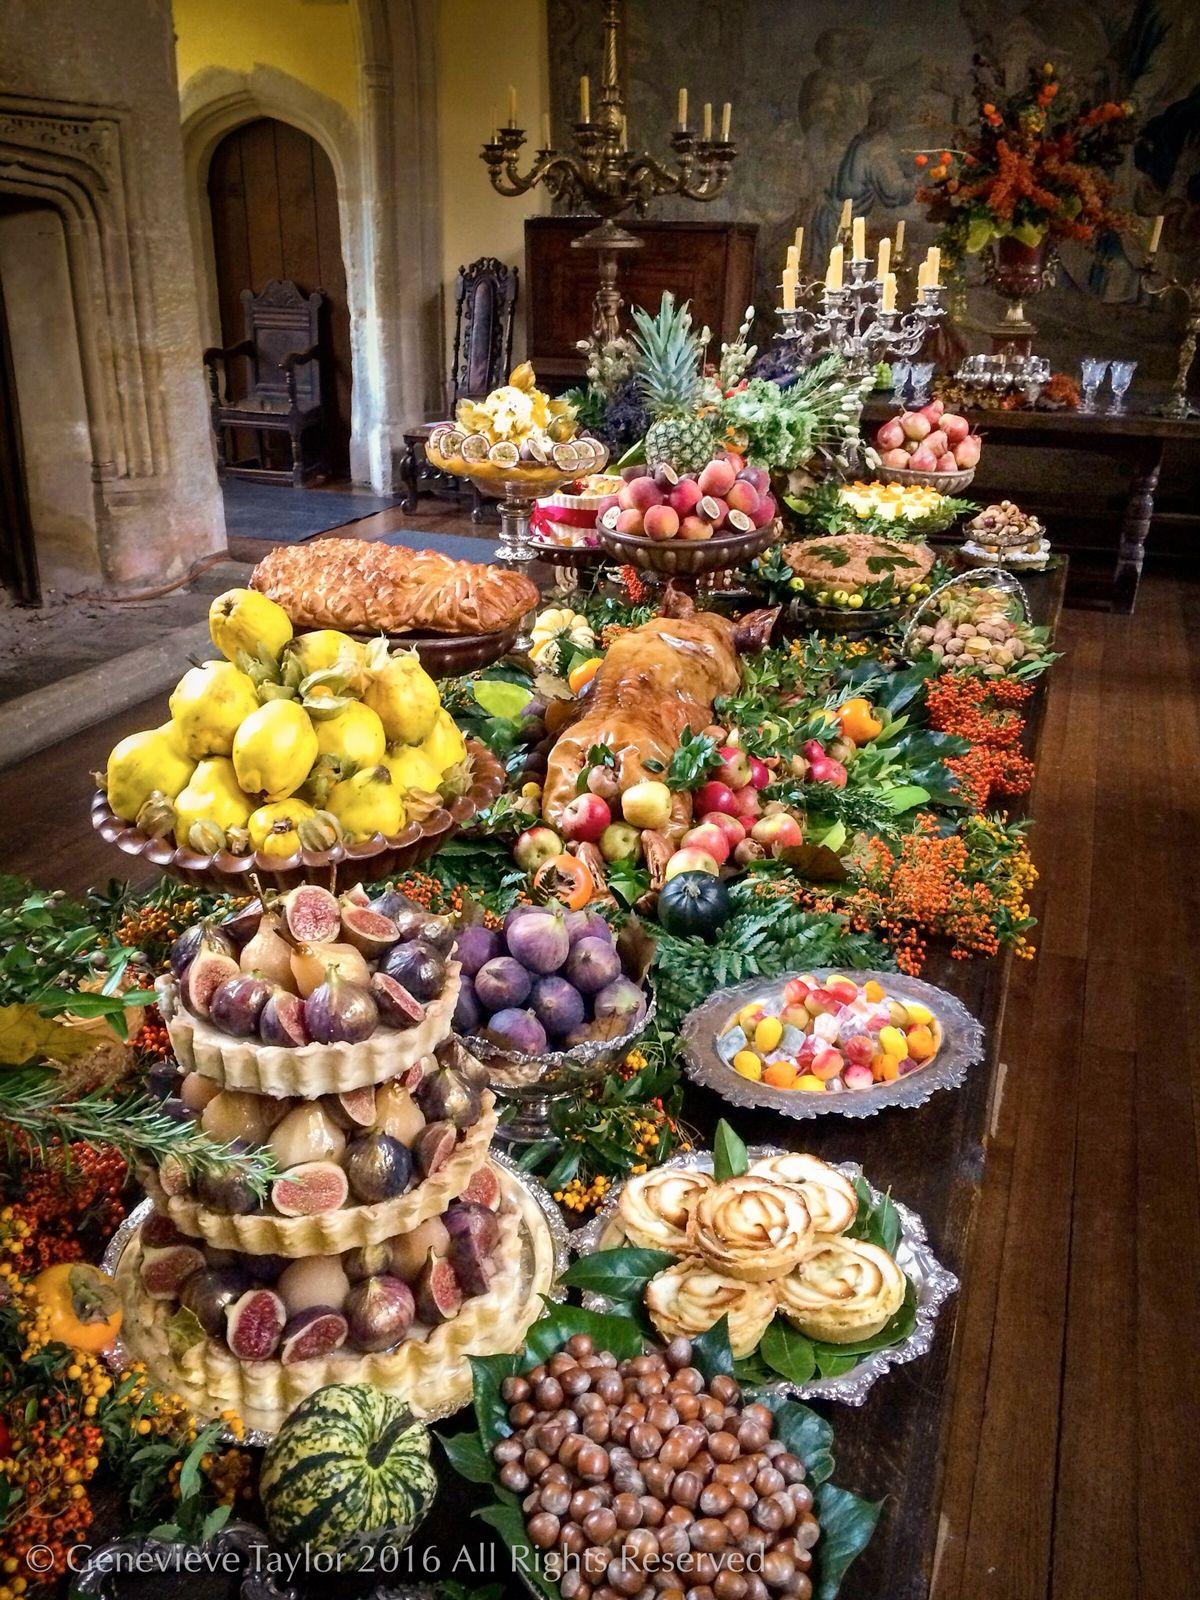 Georgian Harvest Festival Food Genevieve Taylor